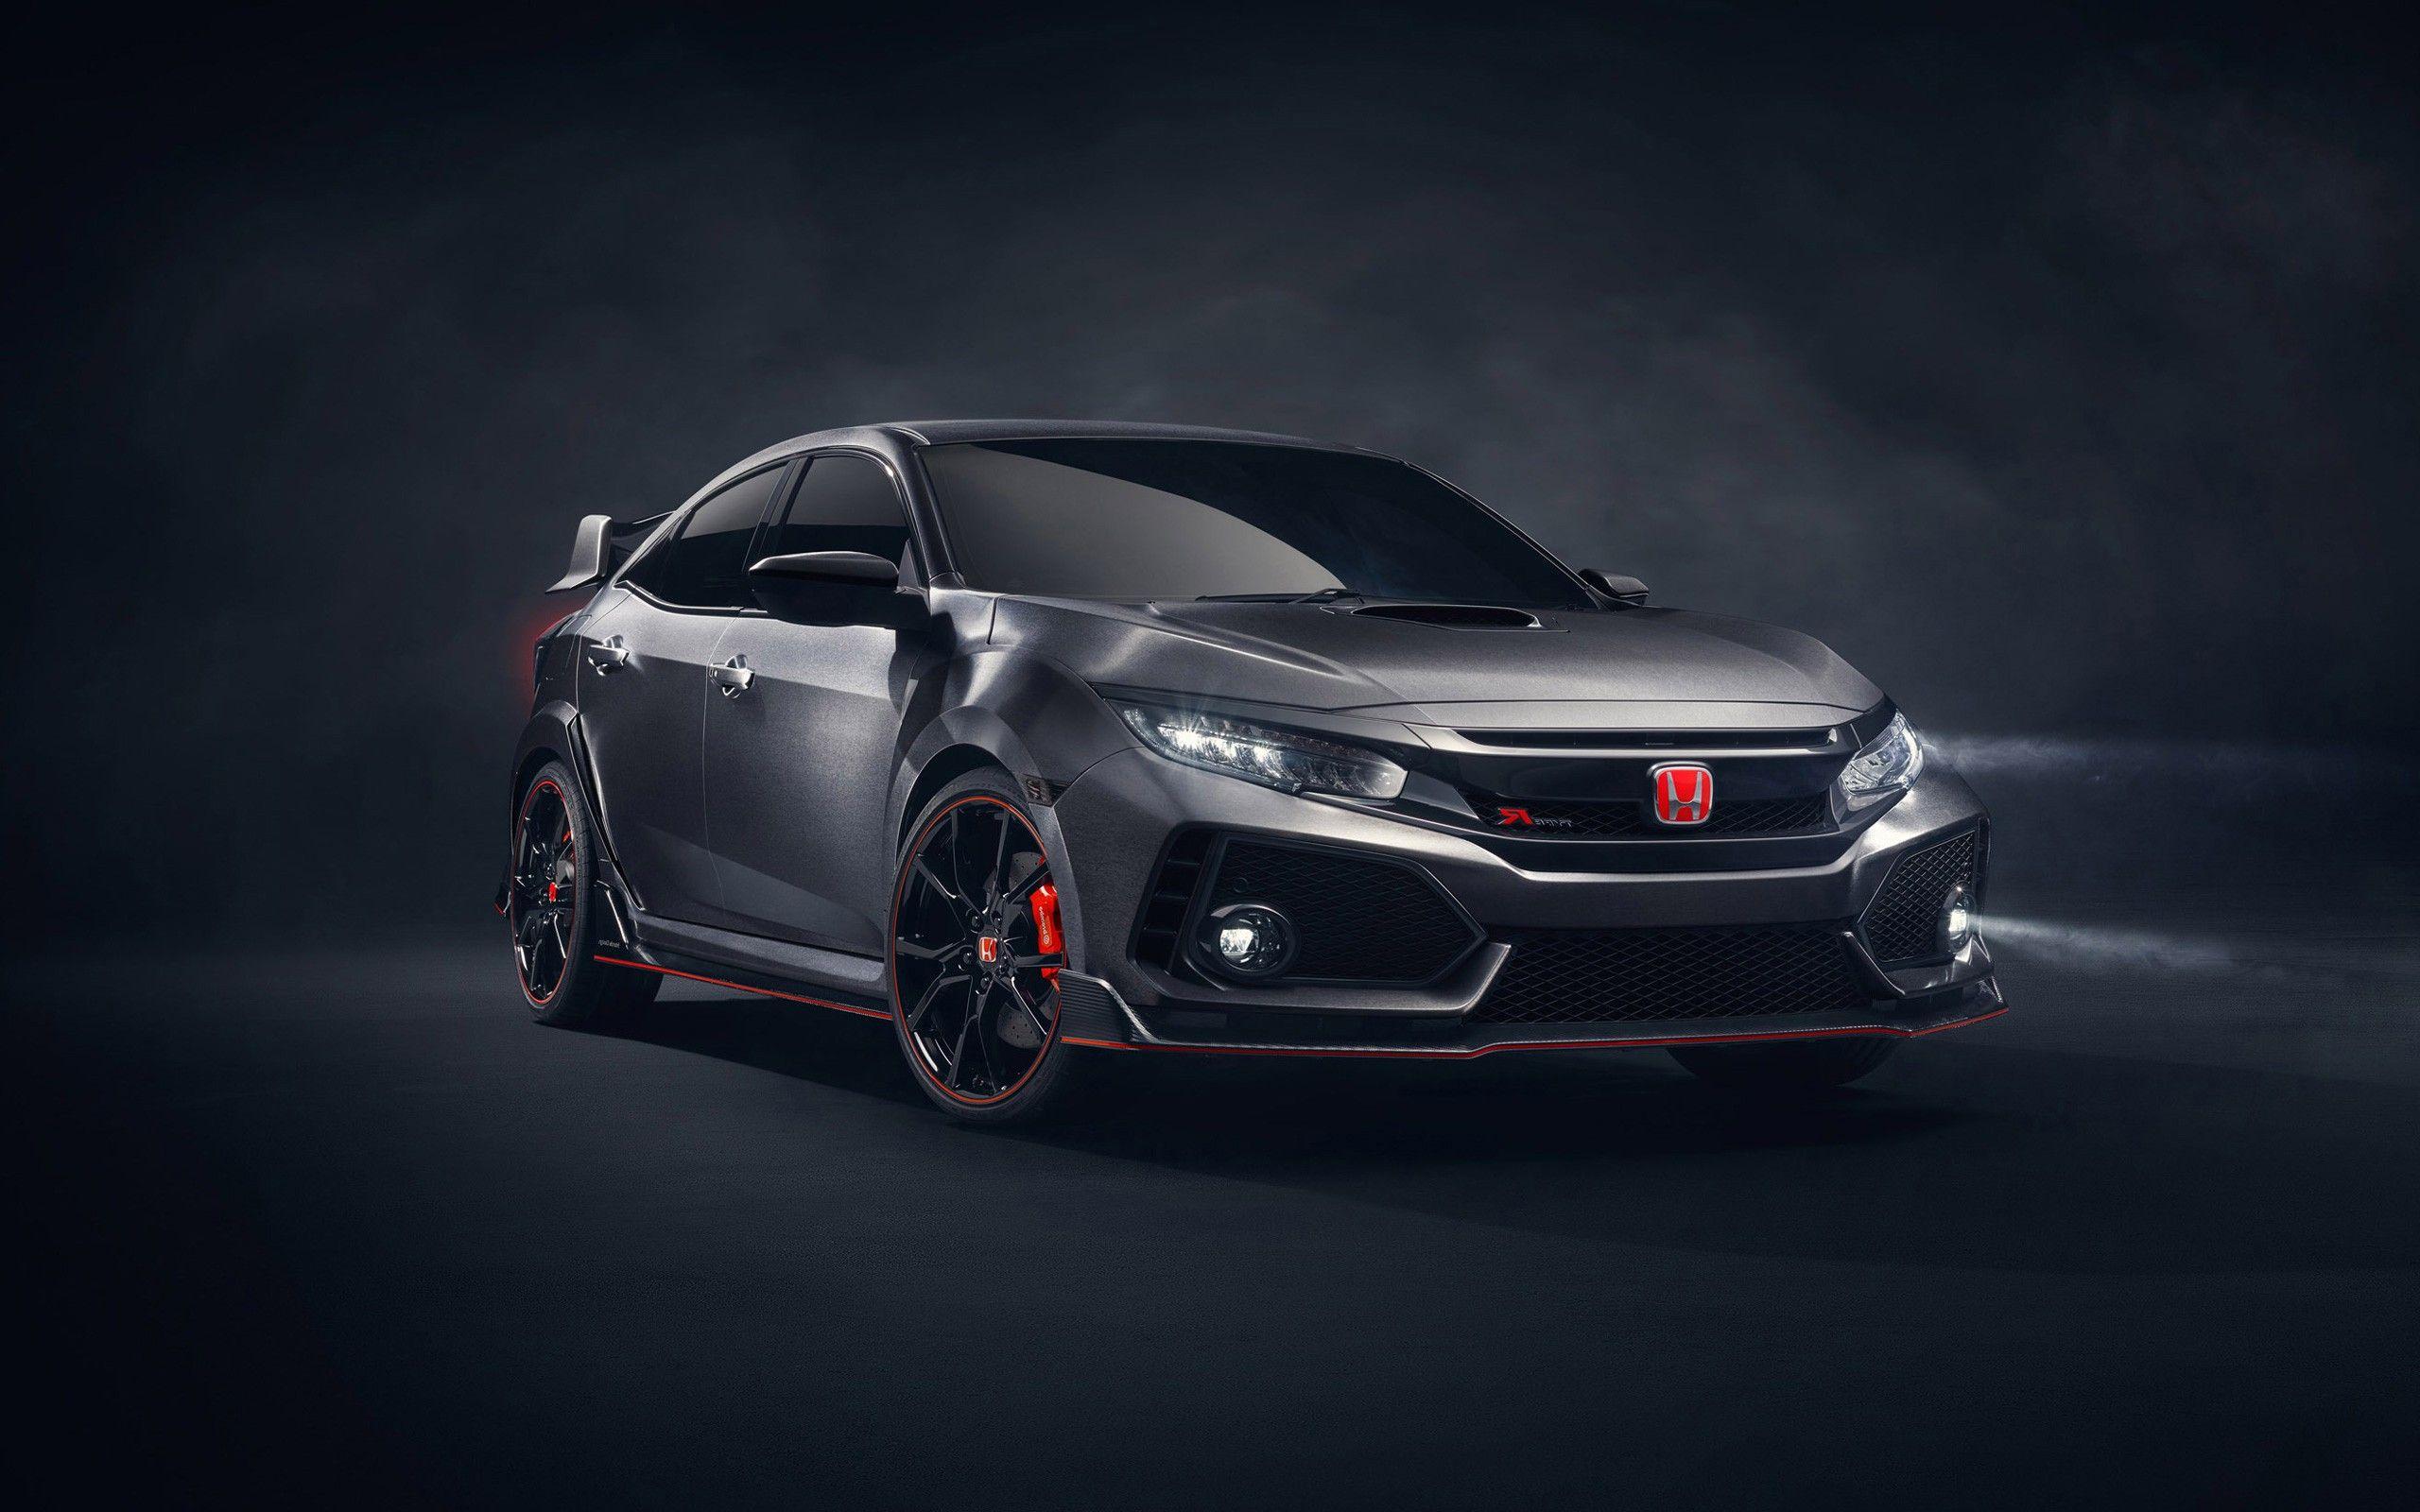 Honda Civic Type R Wallpaper High Definition muF · Cars